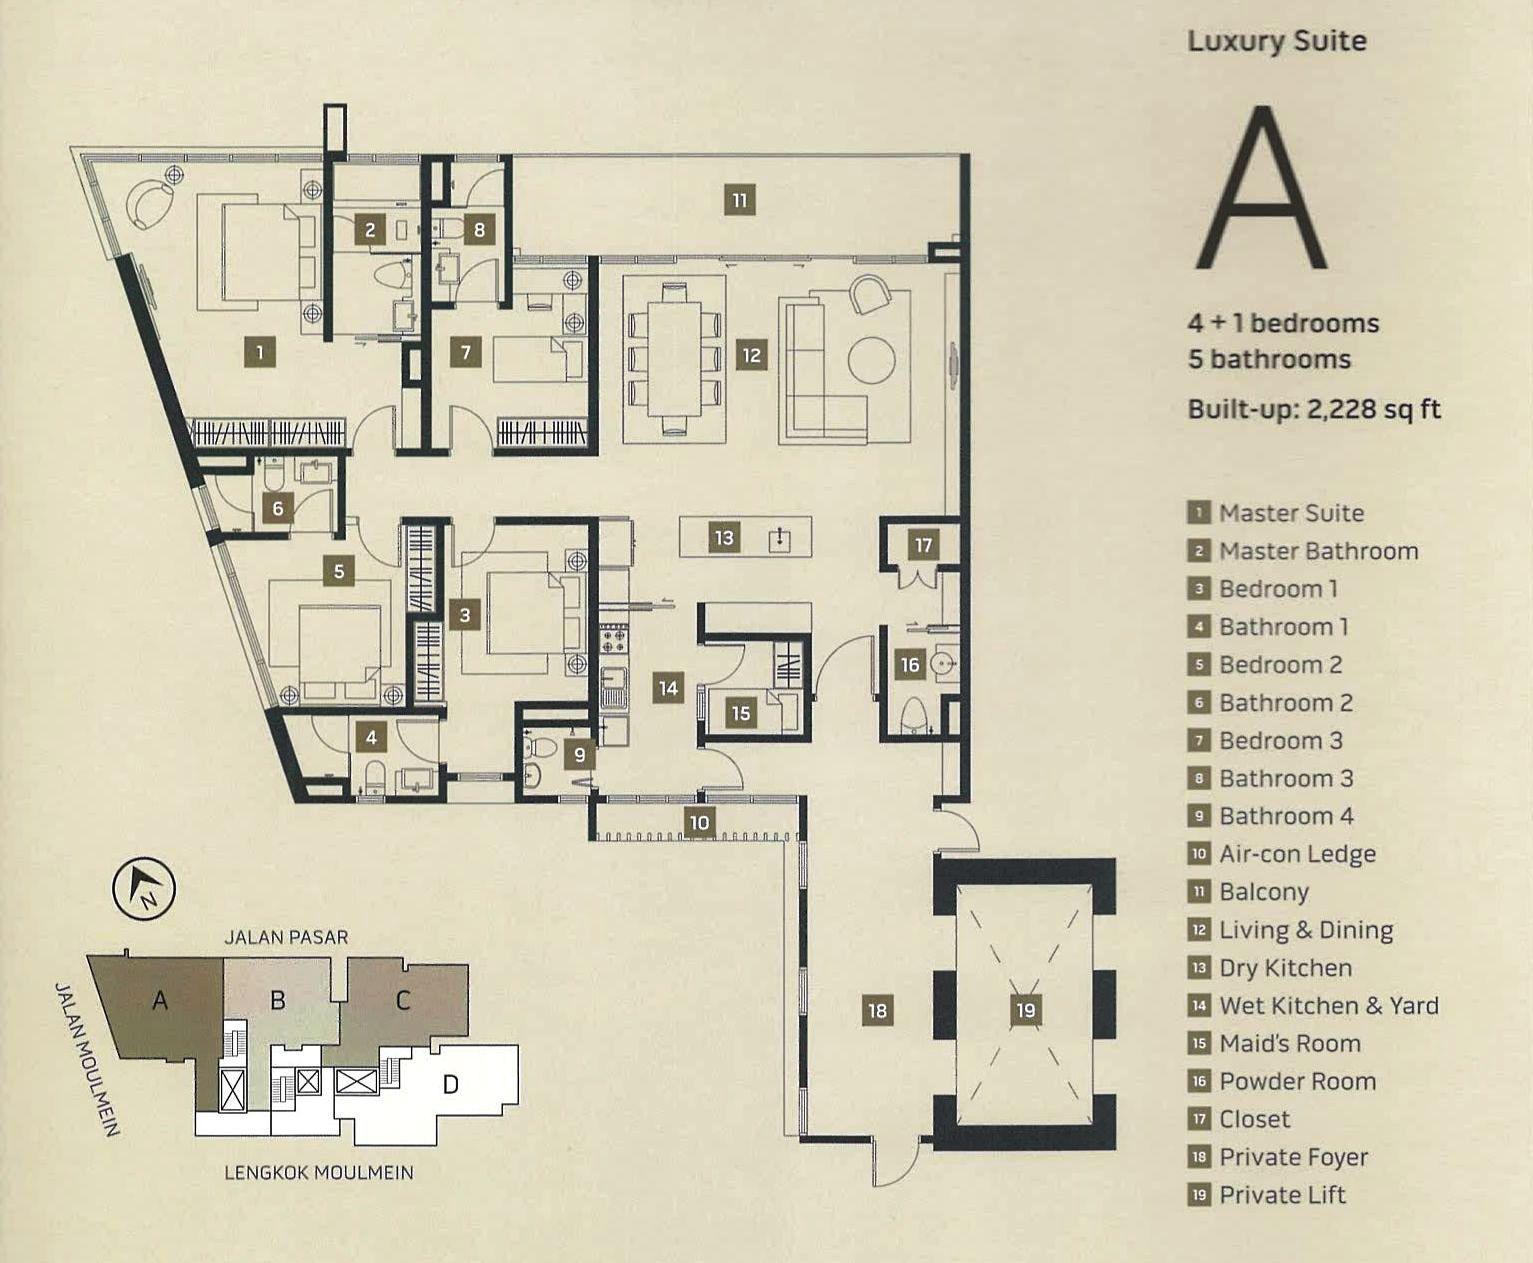 Penang Property Street Mont Residence 38 Storey Seaview Condo